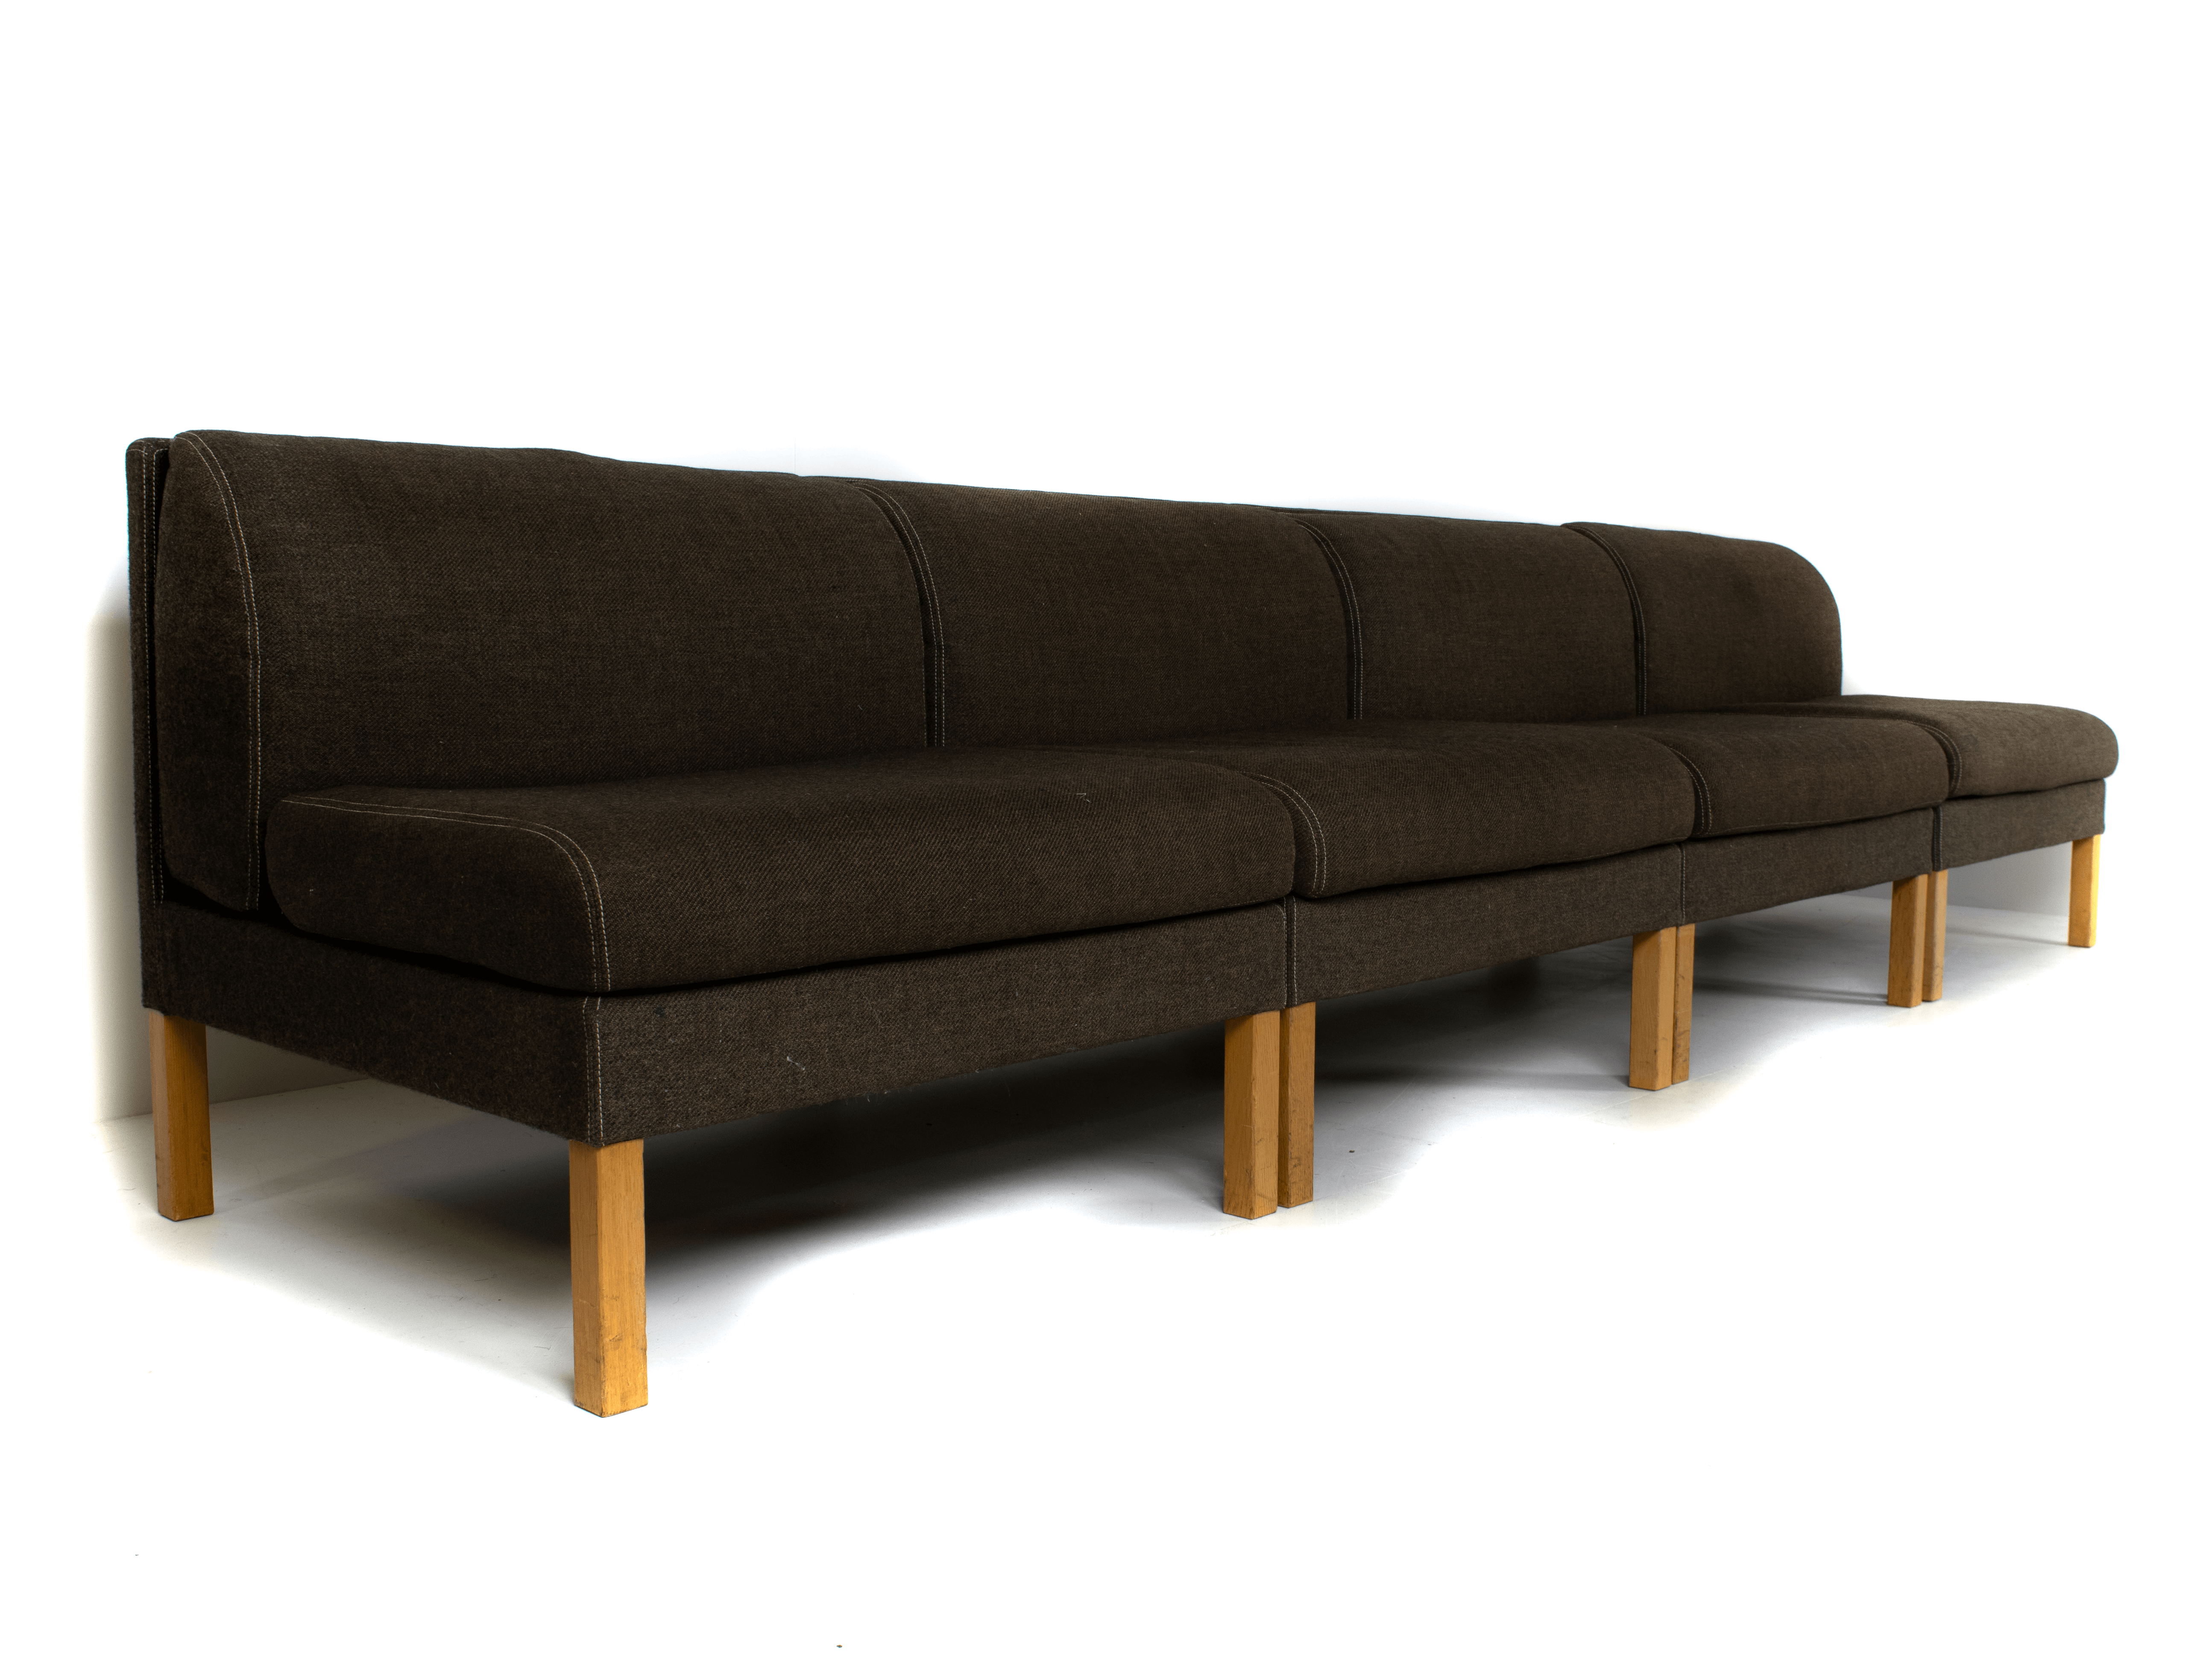 Bernt Petersen Modular Sofa in Oak and Saga 180 Fabric, Denmark 1980